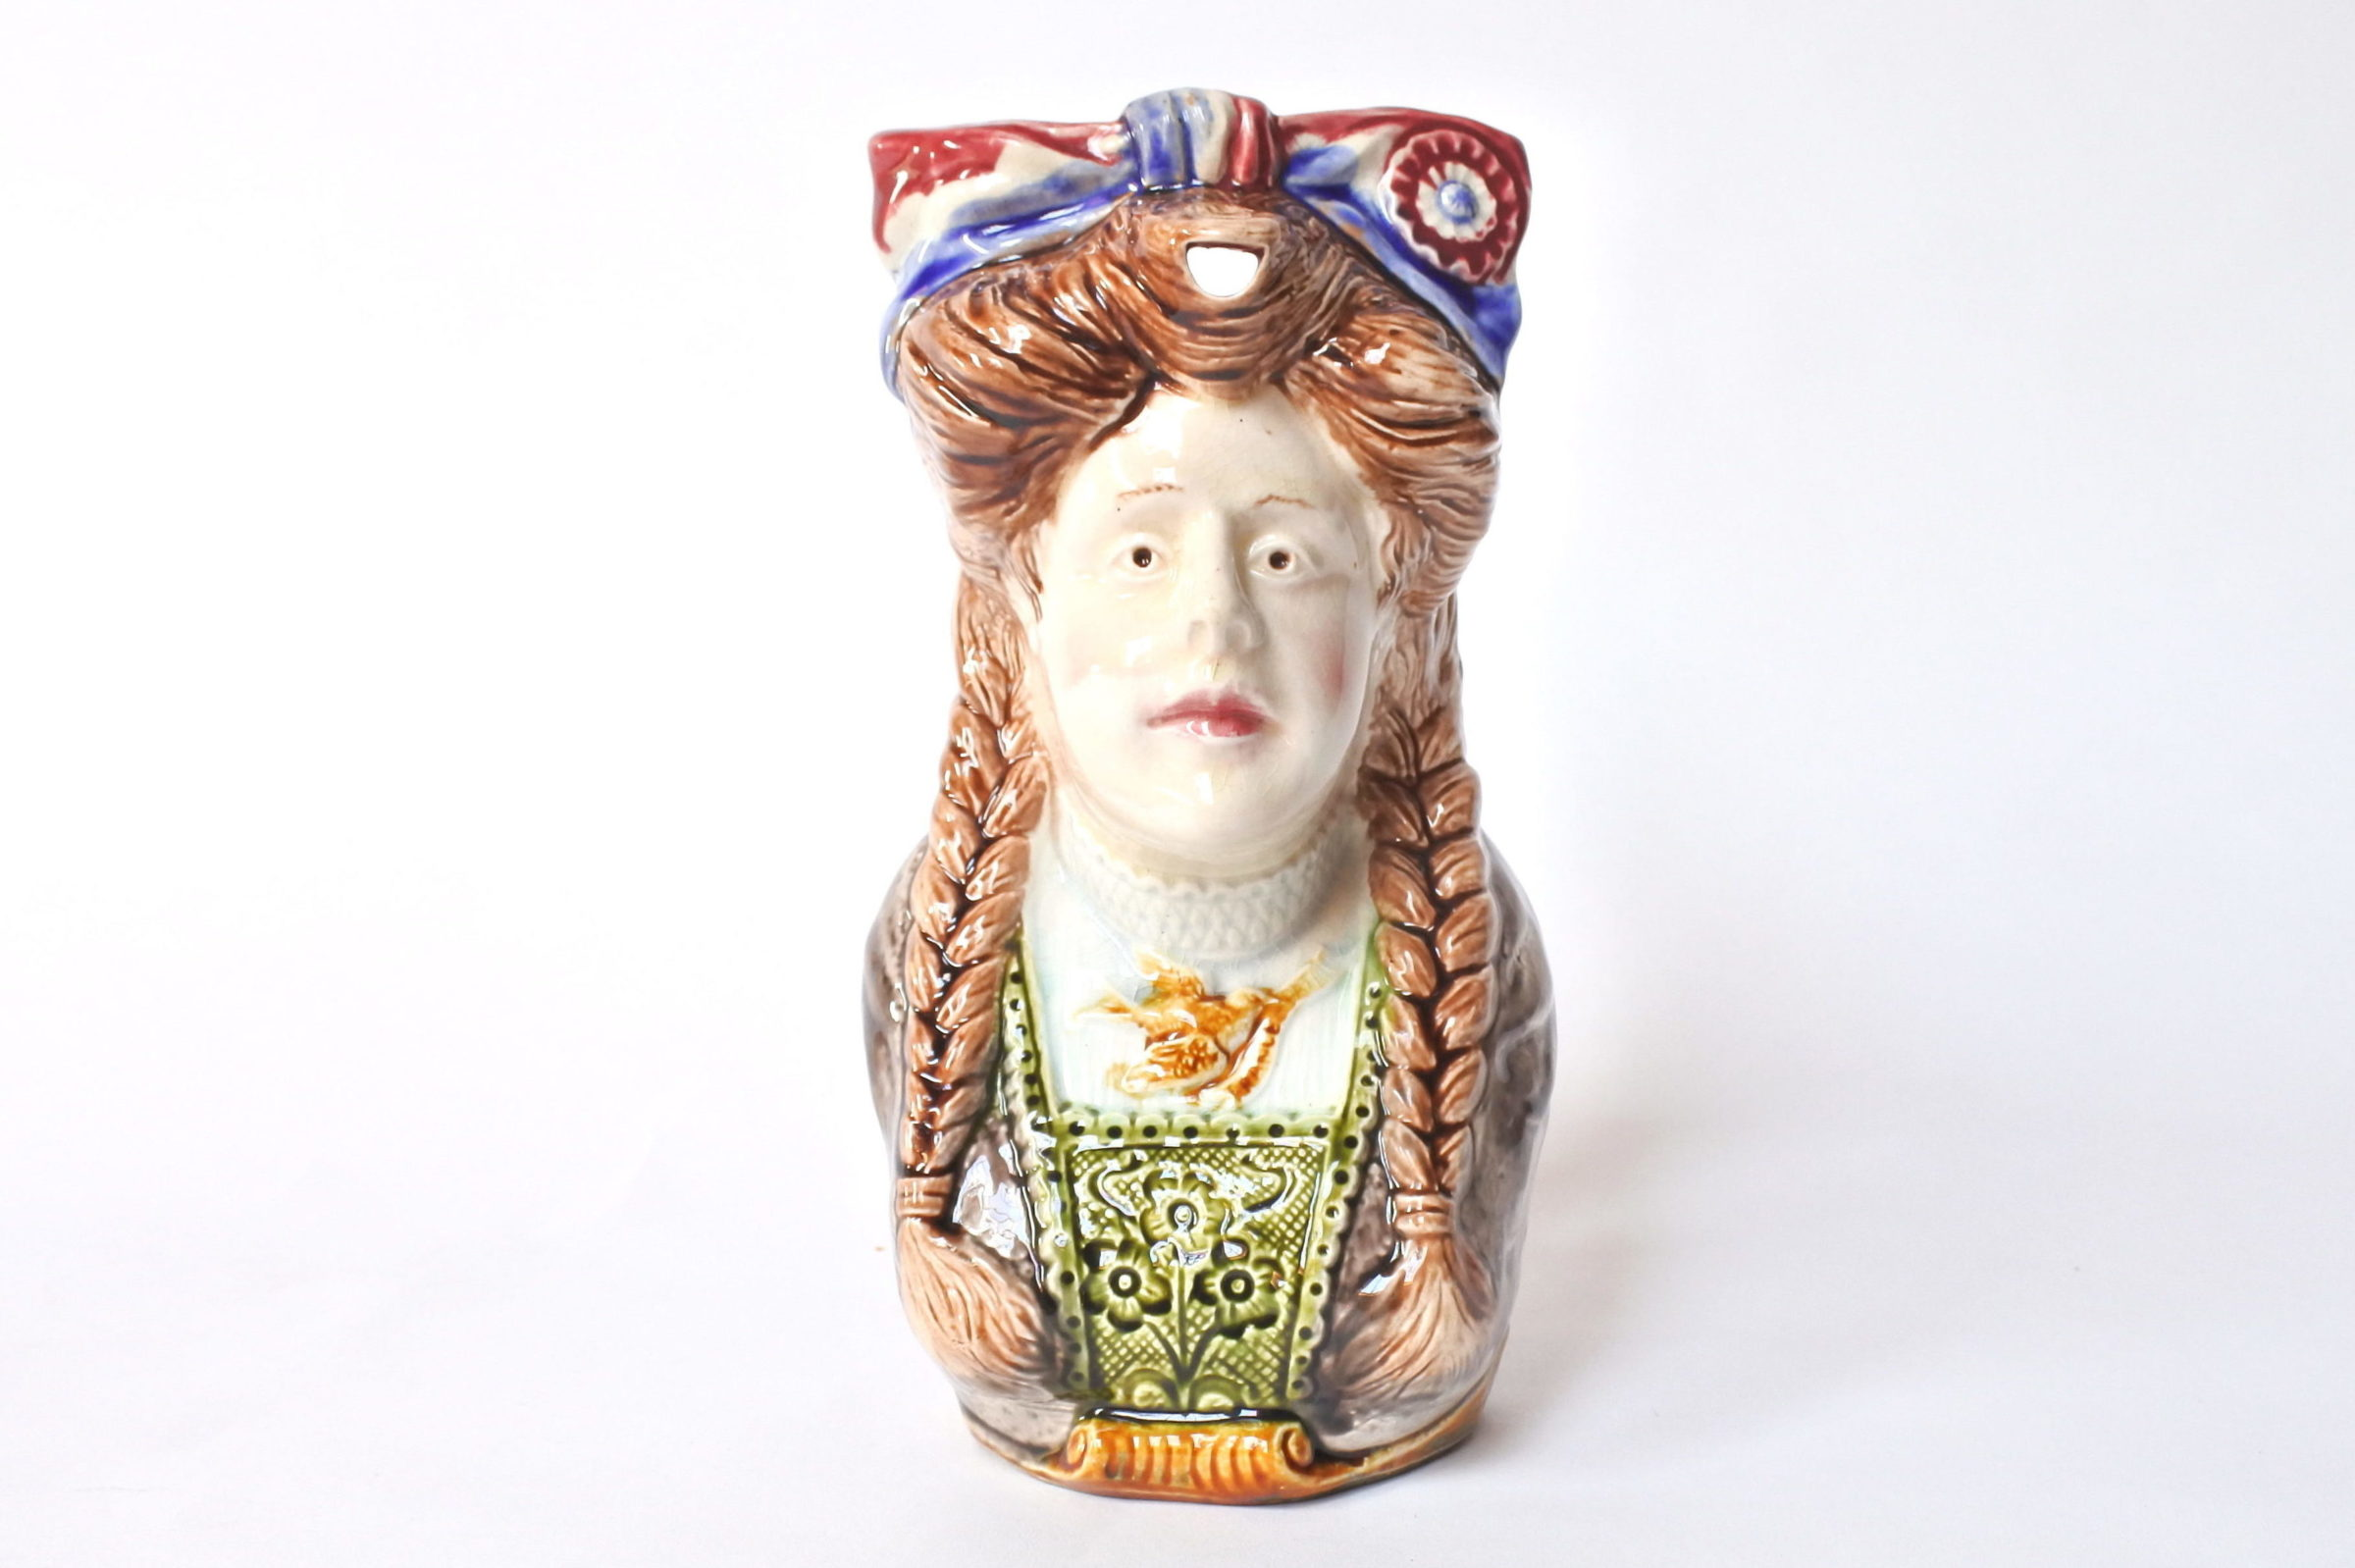 Brocca in ceramica barbotine a forma di volto donna - Onnaing n° 808 - 5